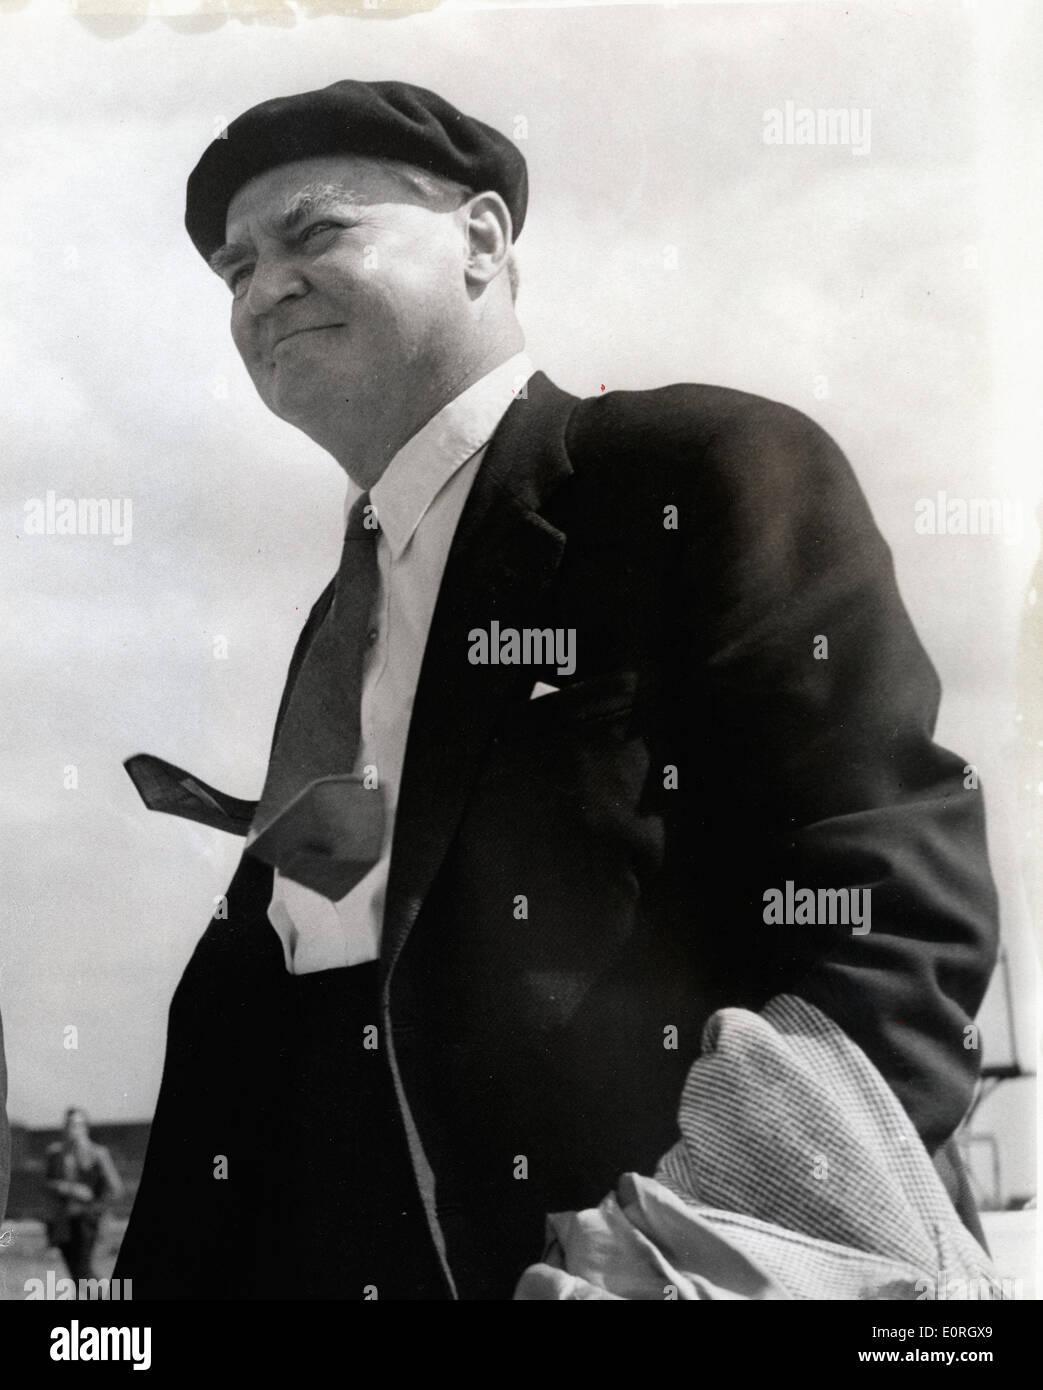 Deputy Leader Aneurin Bevan at airport - Stock Image